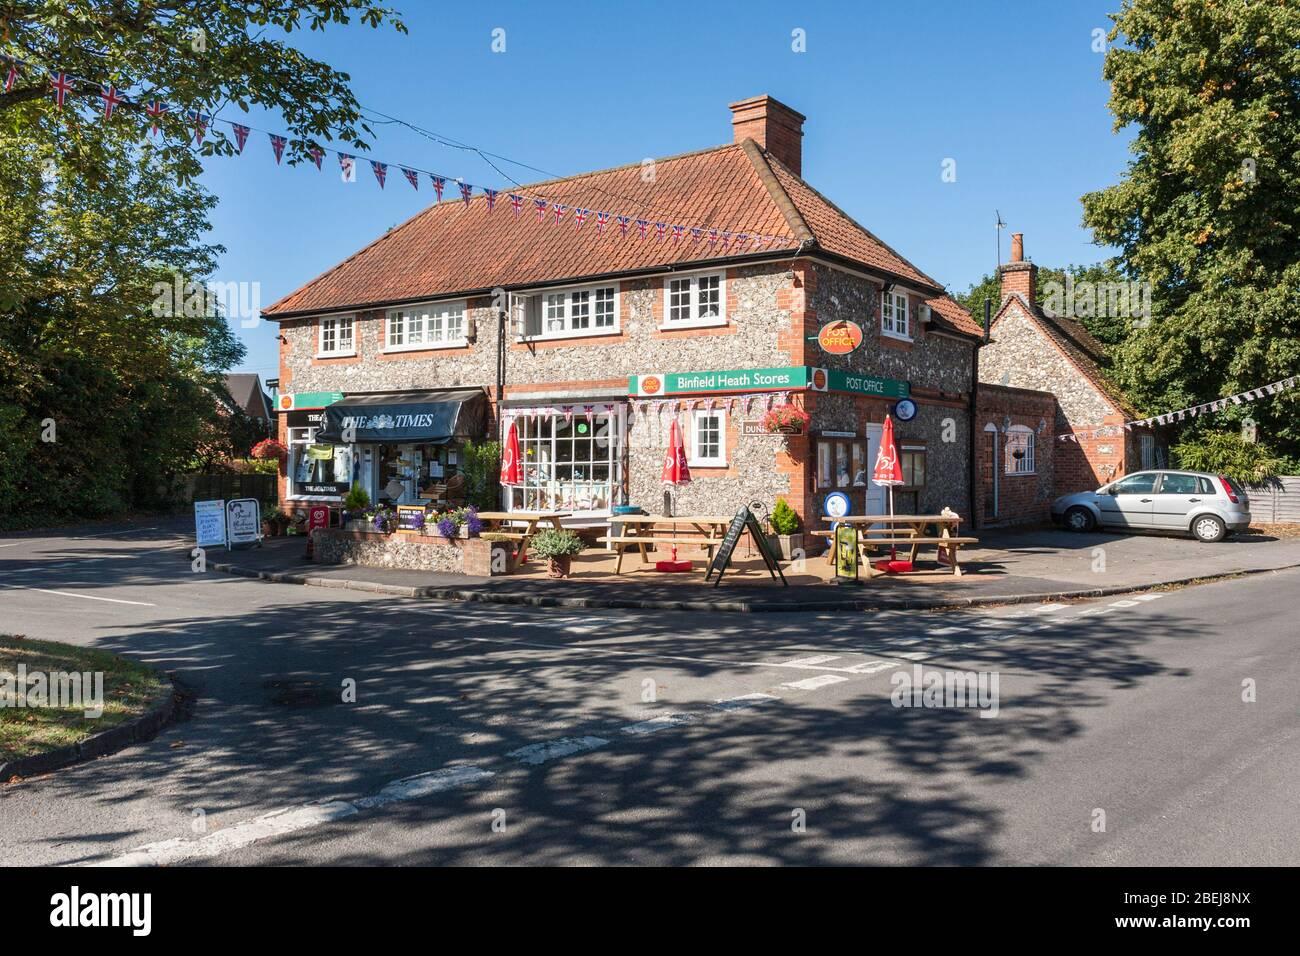 Village sub-Post Office, newsagents and local stores, Binfield Heath, Berkshire, England, GB, UK. Stock Photo